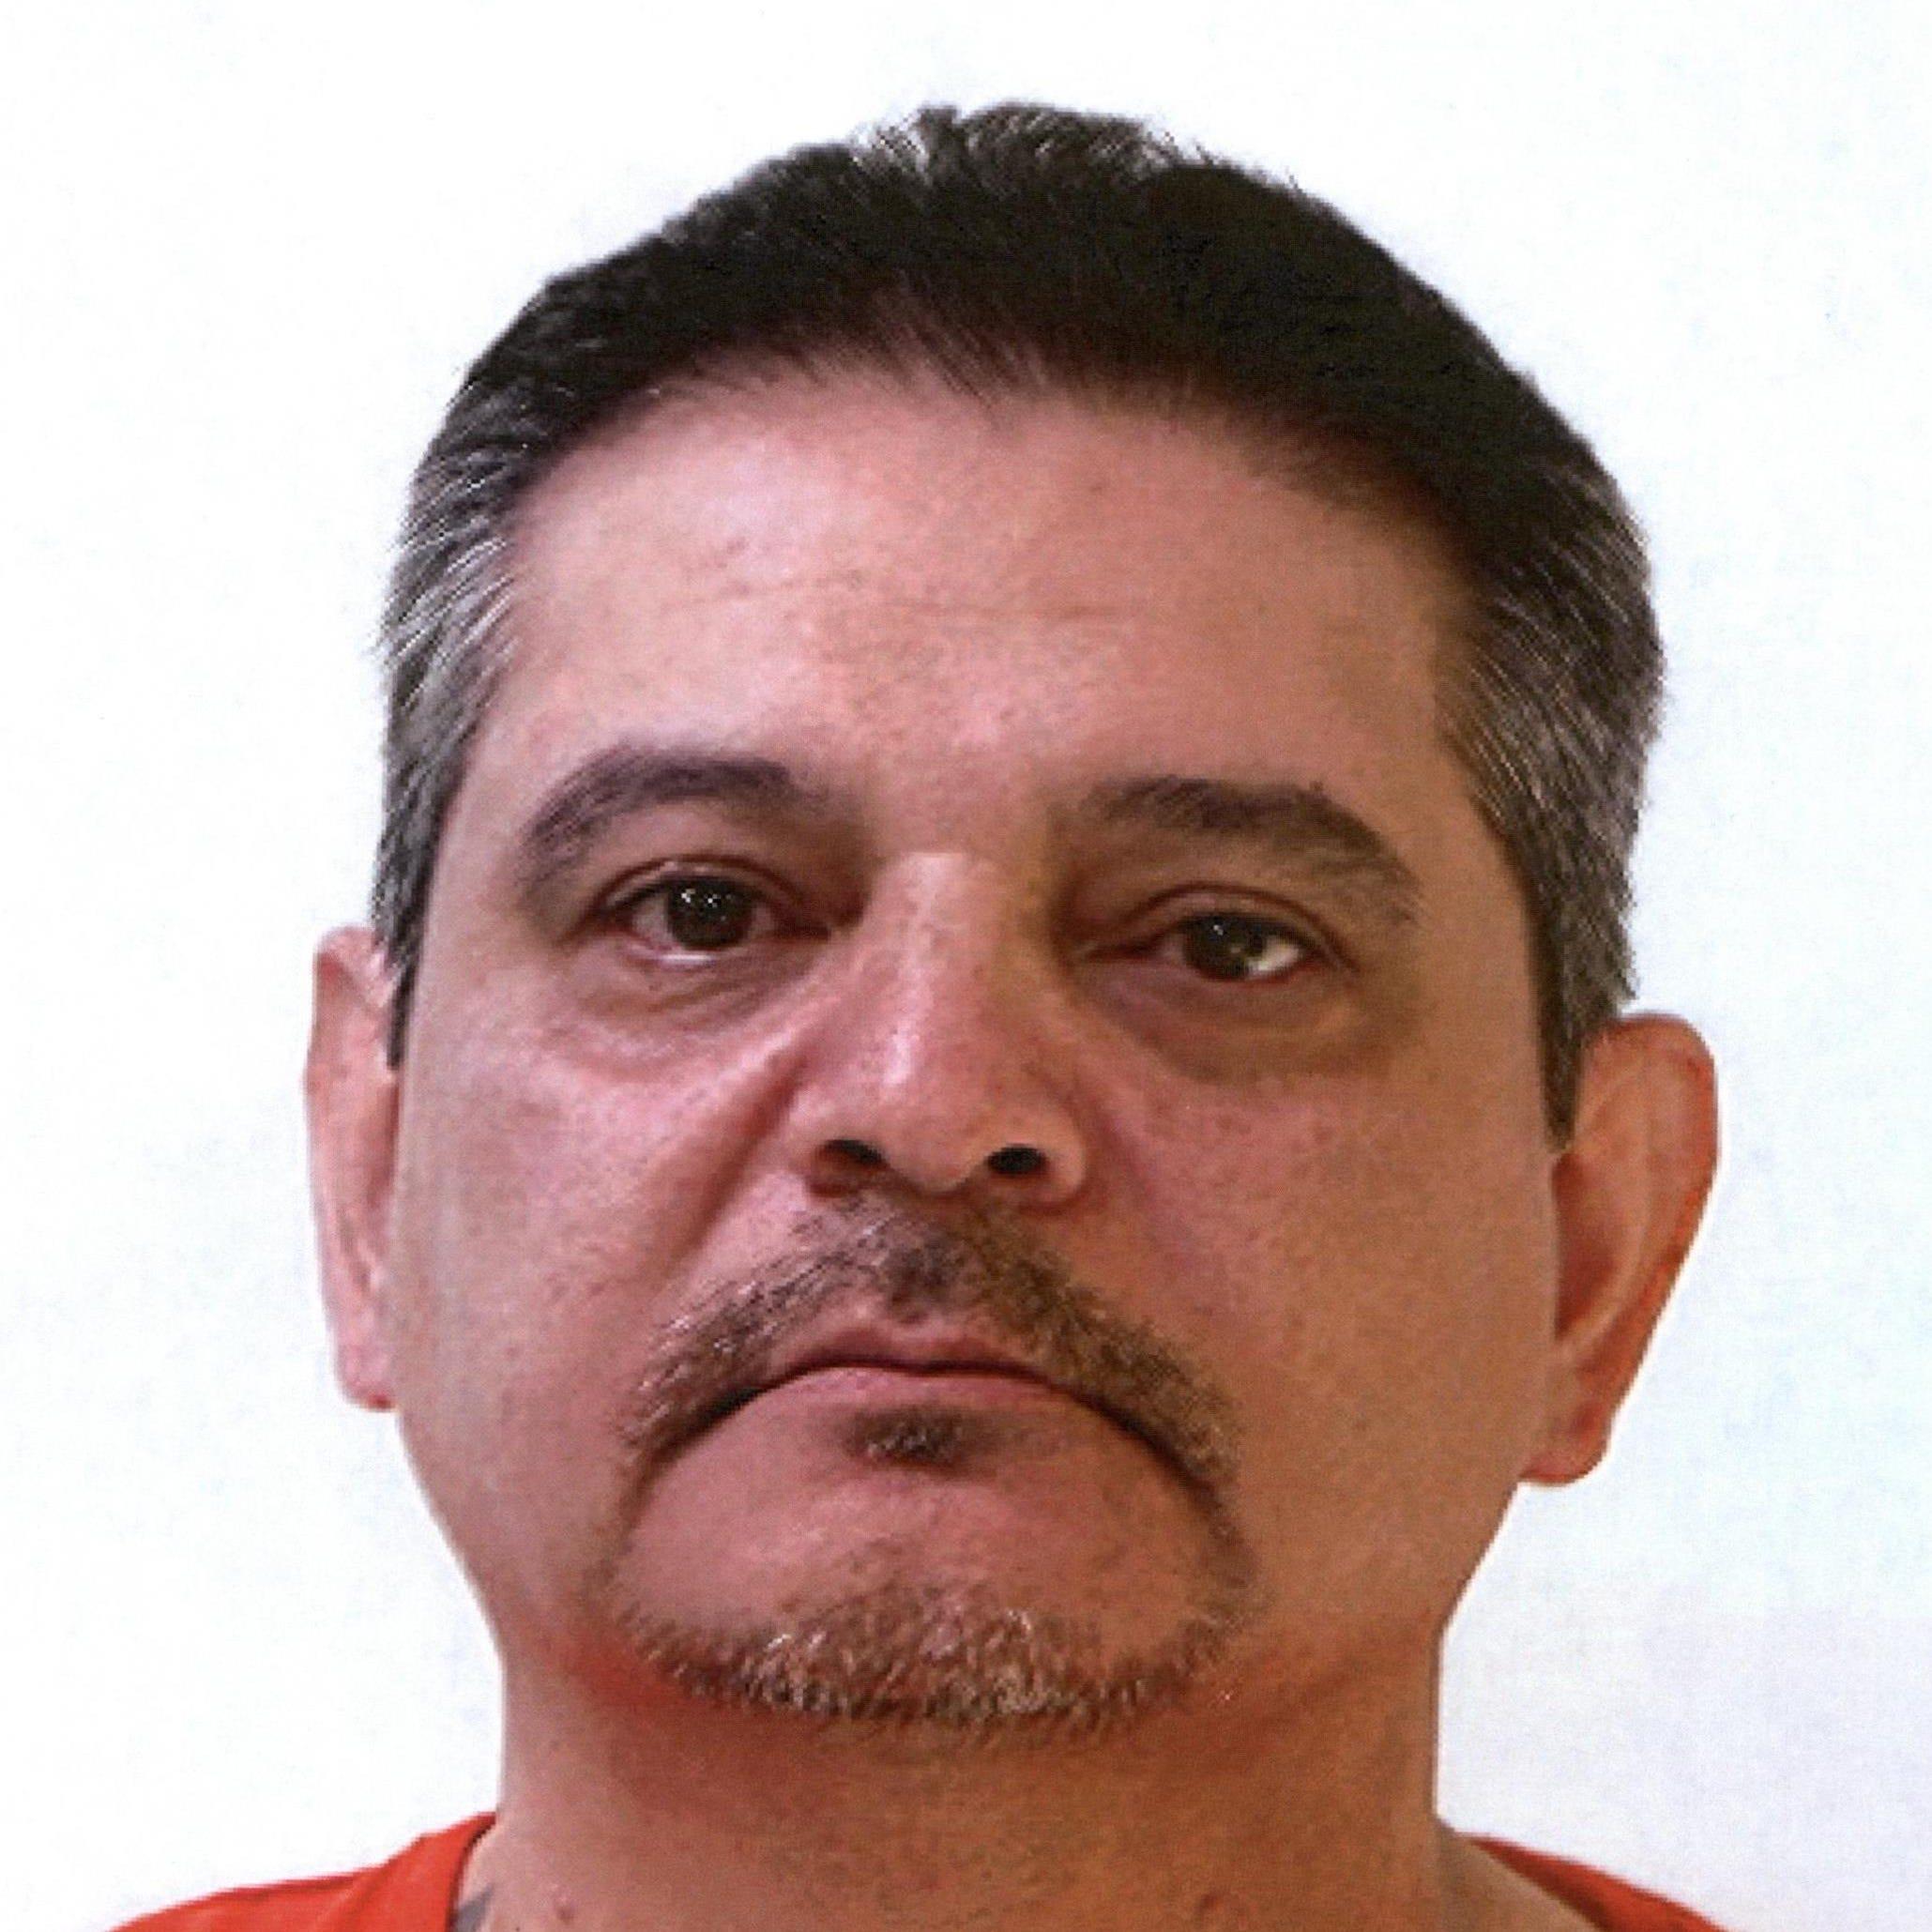 Barrio Azteca member sentence to 19 years for drug trafficking